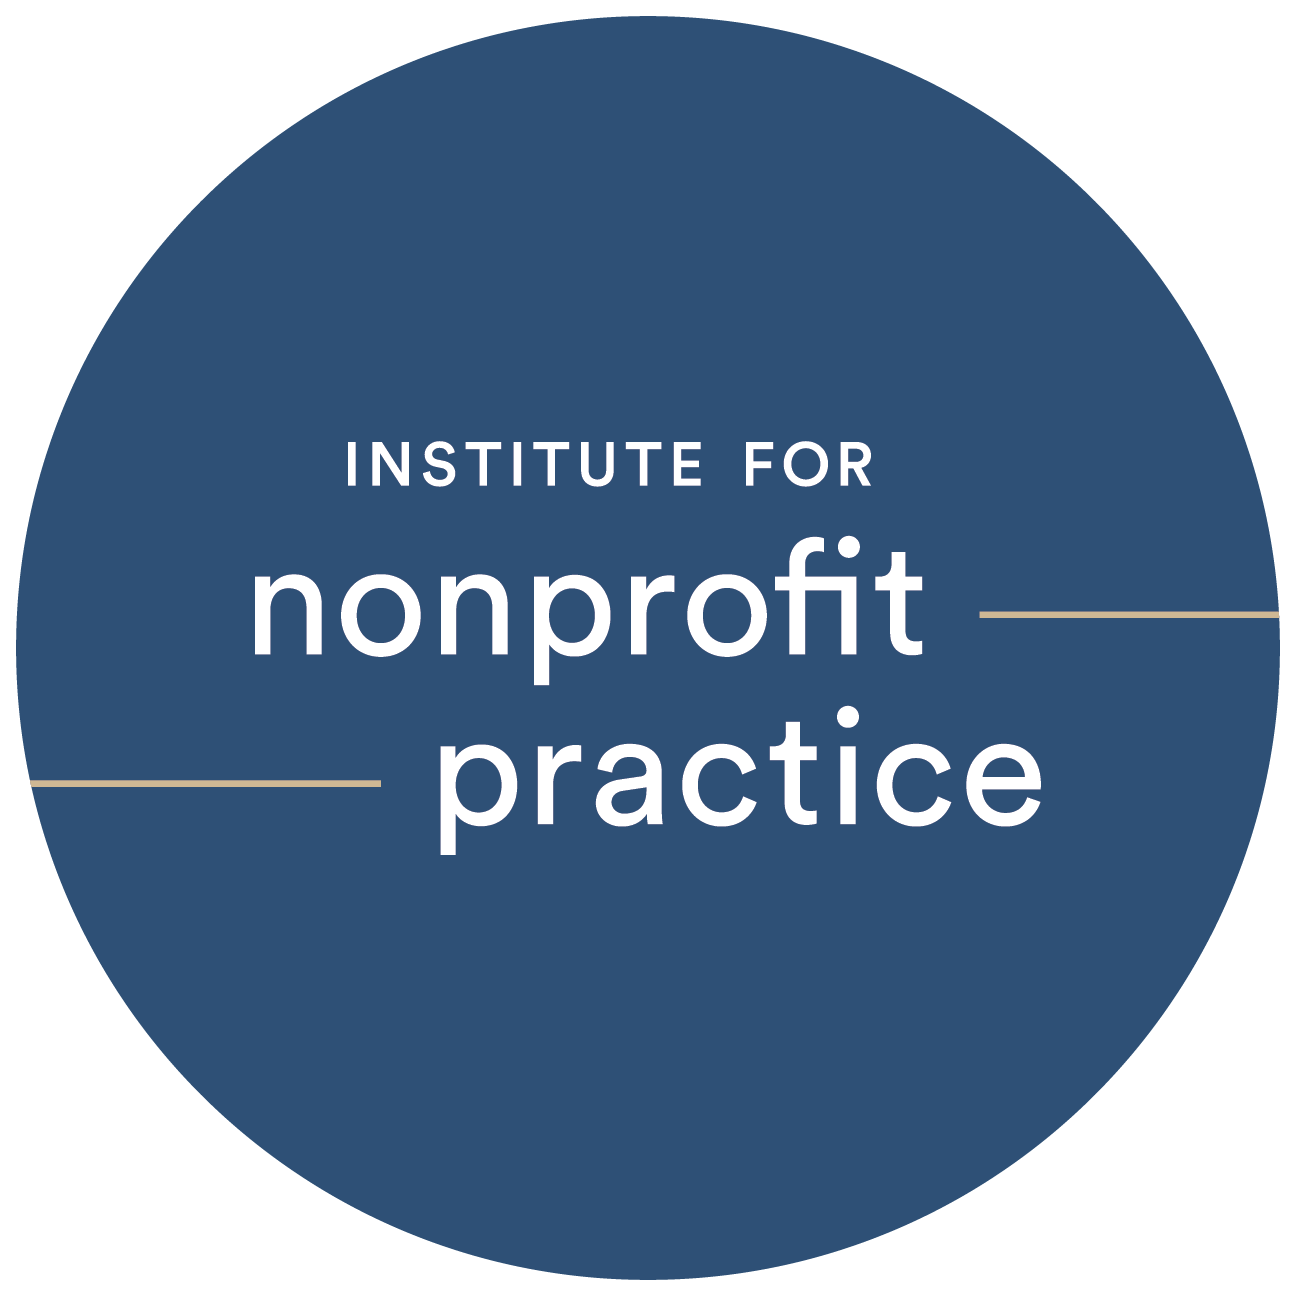 Archive Core Certificate Program Institute For Nonprofit Practice